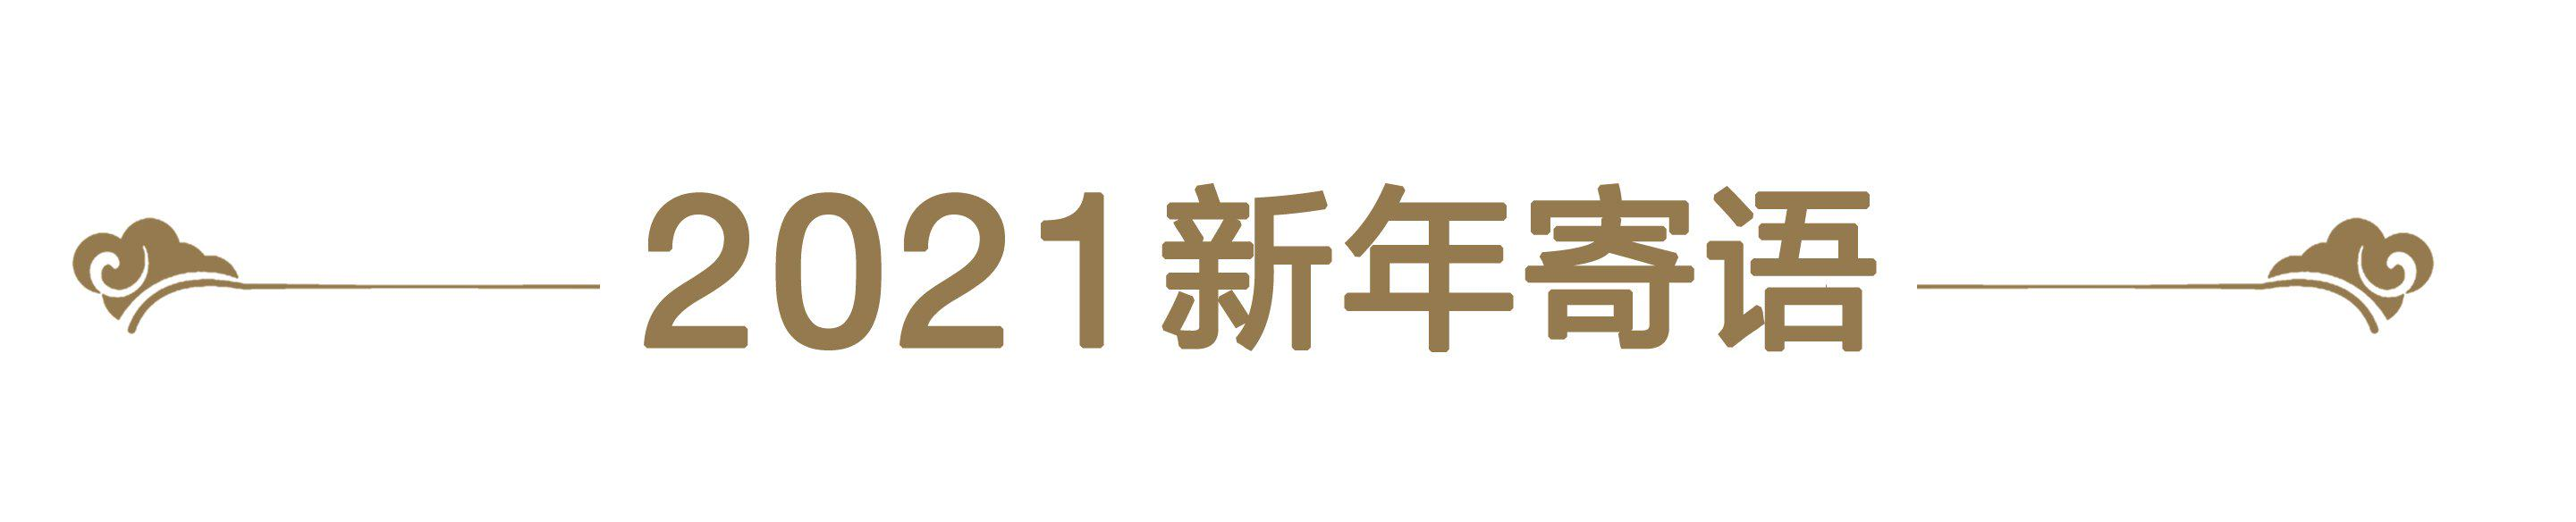 usdt钱包支付(caibao.it):新华保险李全:穿越周期 一起向前 第1张